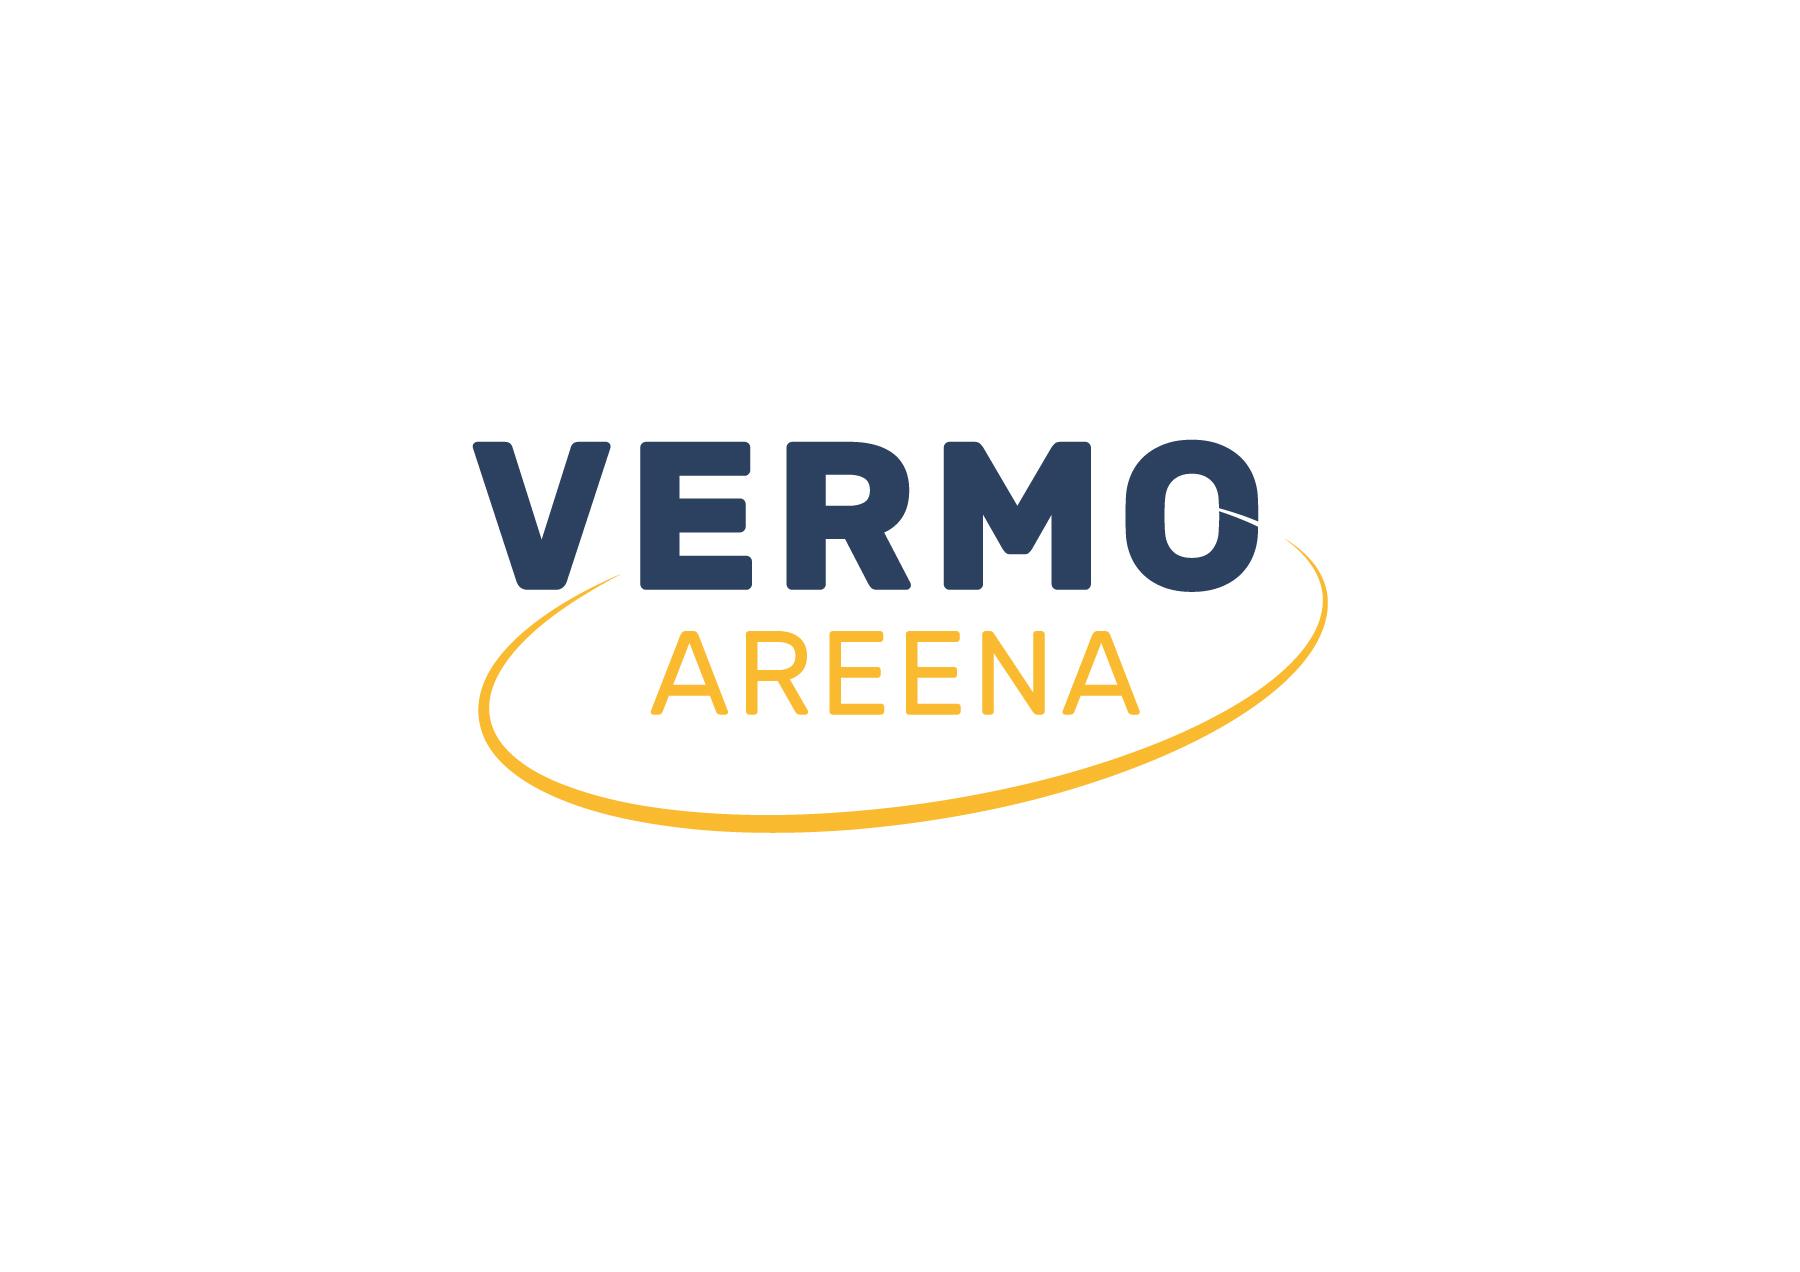 Vermo Areena